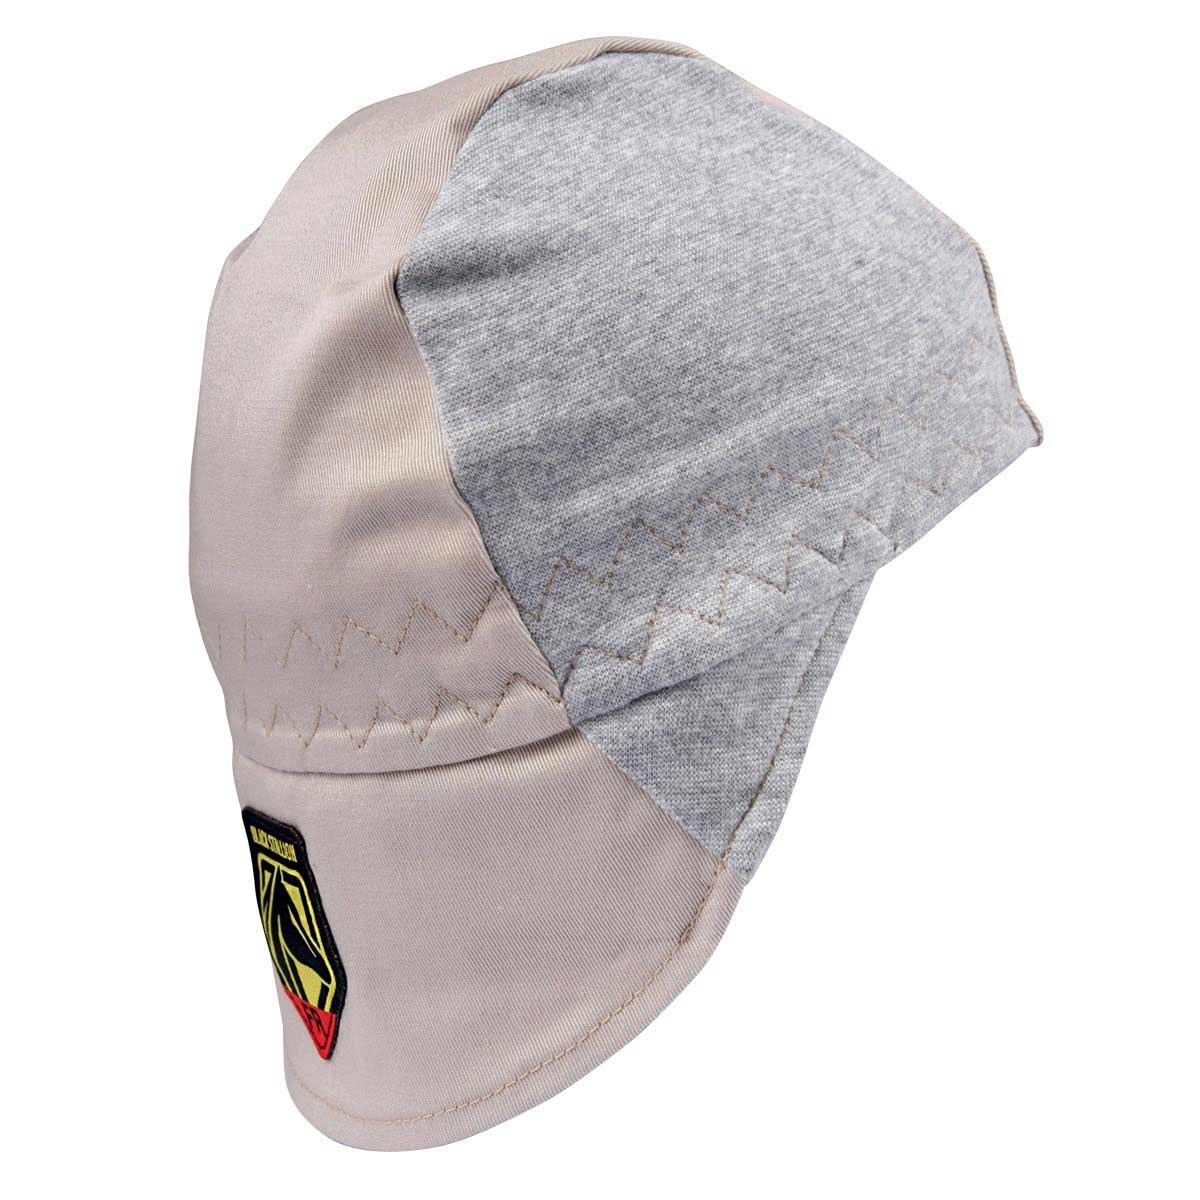 FR COTTON WELDING CAP WITH HIDDEN BILL EXTENSION. Pack 1. Small. AH1630-NG-SML